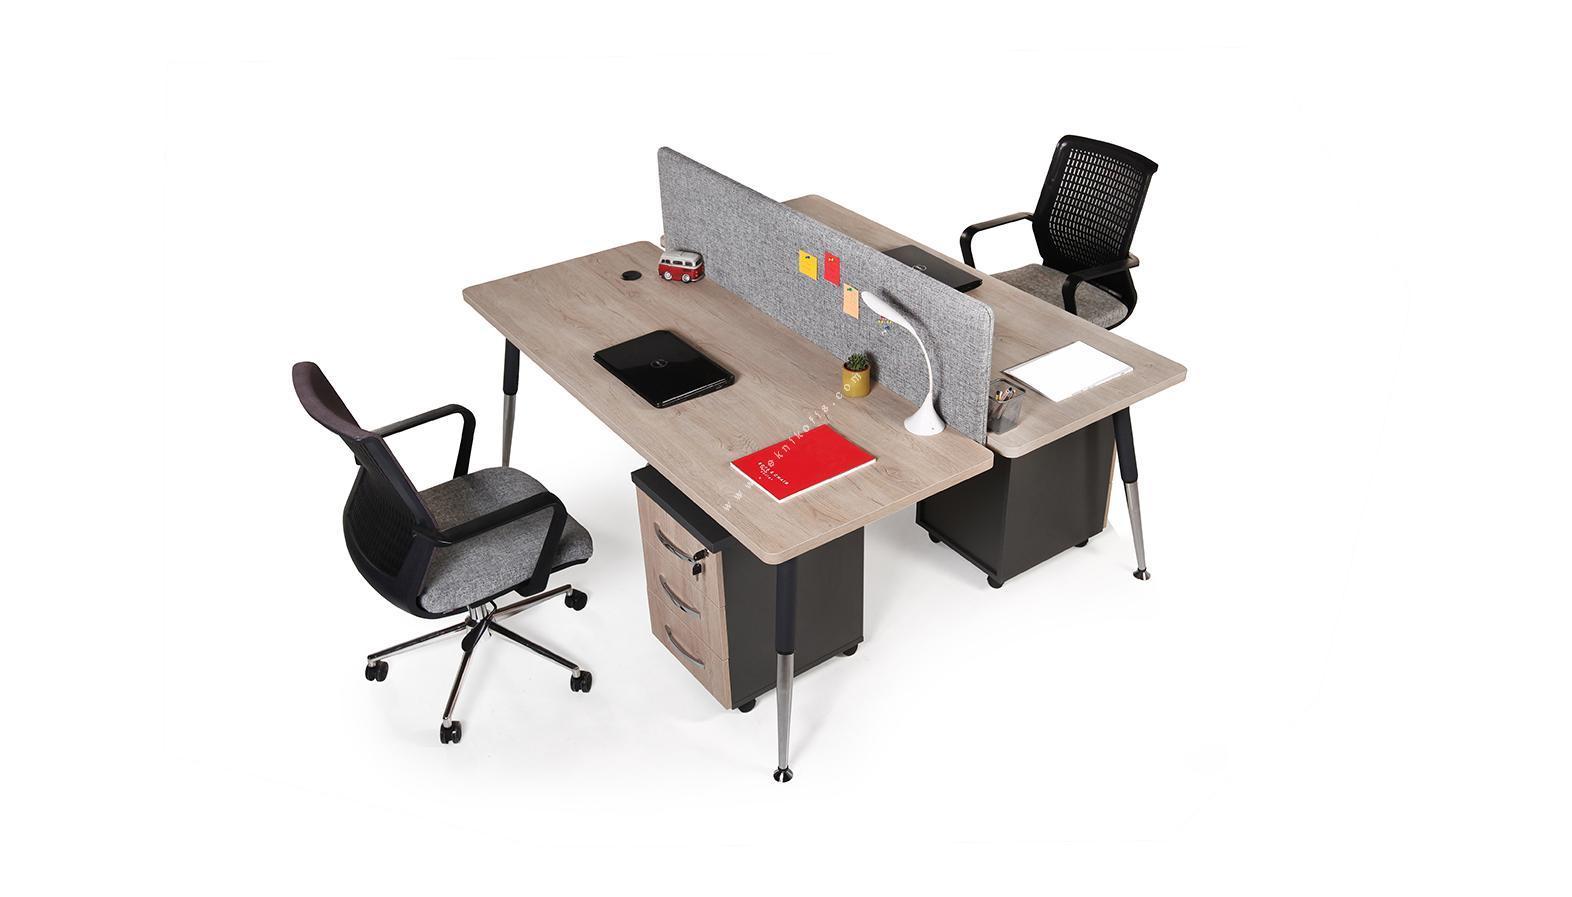 toucher kumaş panelli ikili workstation